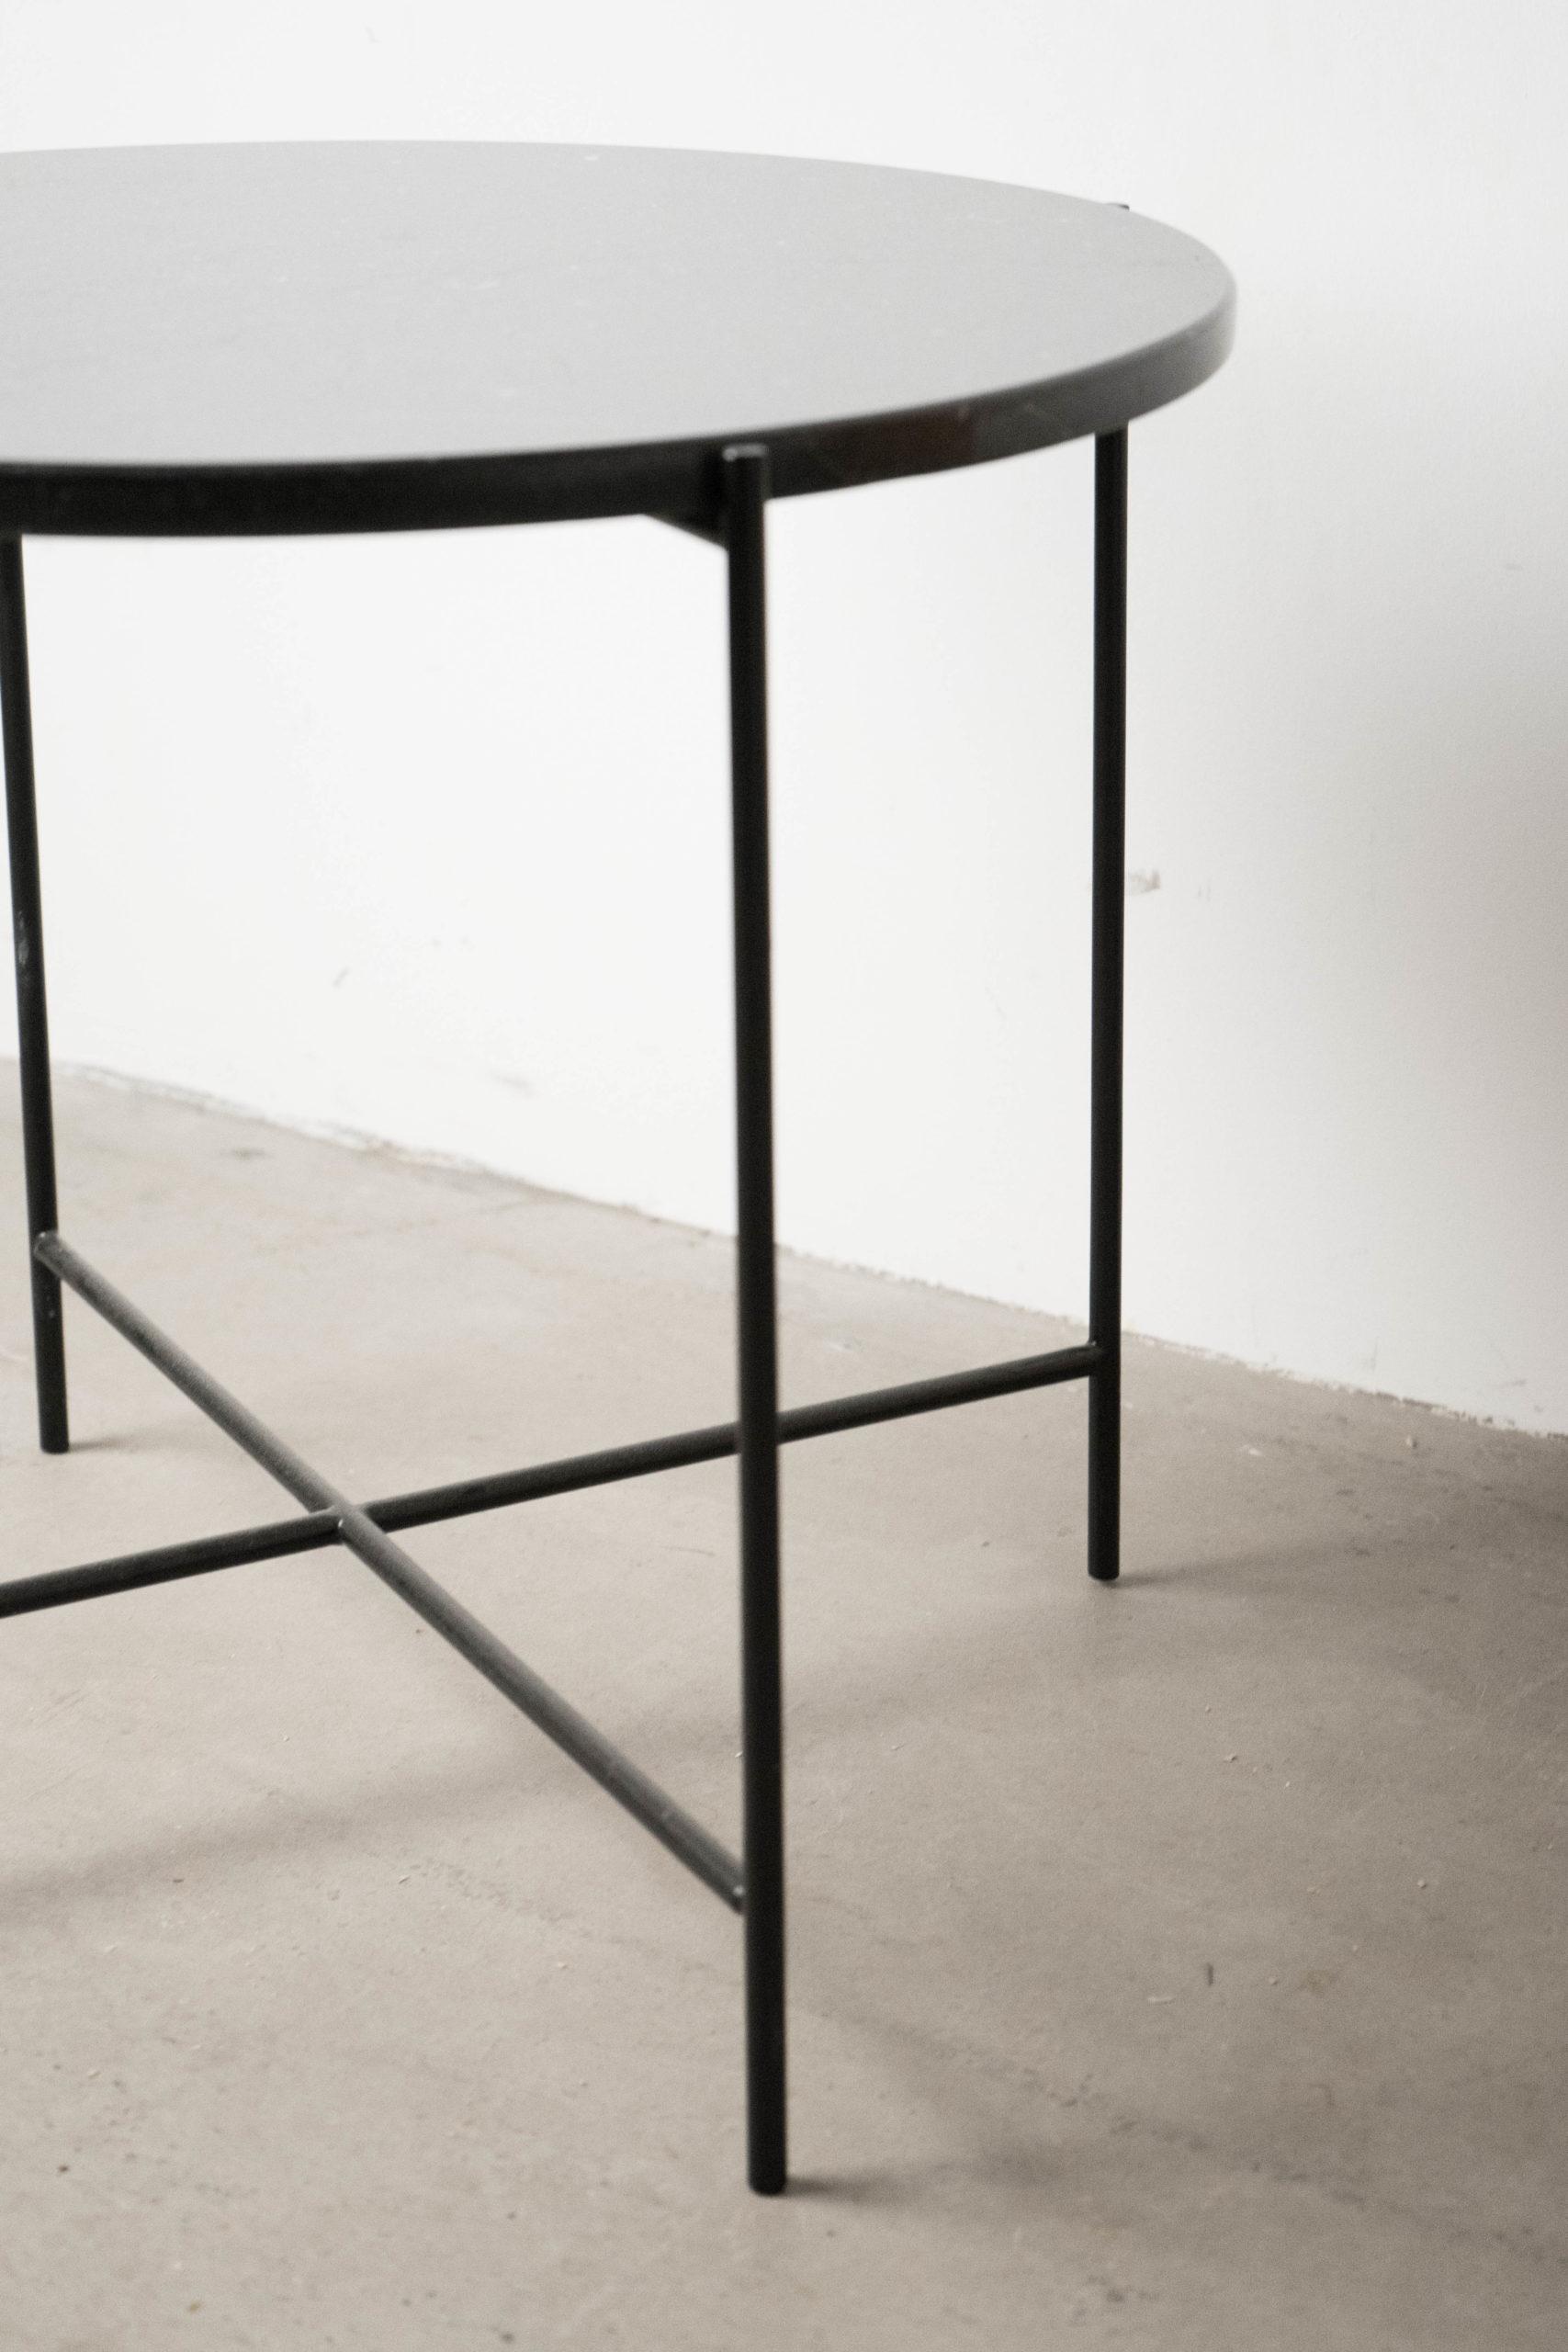 vista general mesa grande detalle auxiliar negra marmol